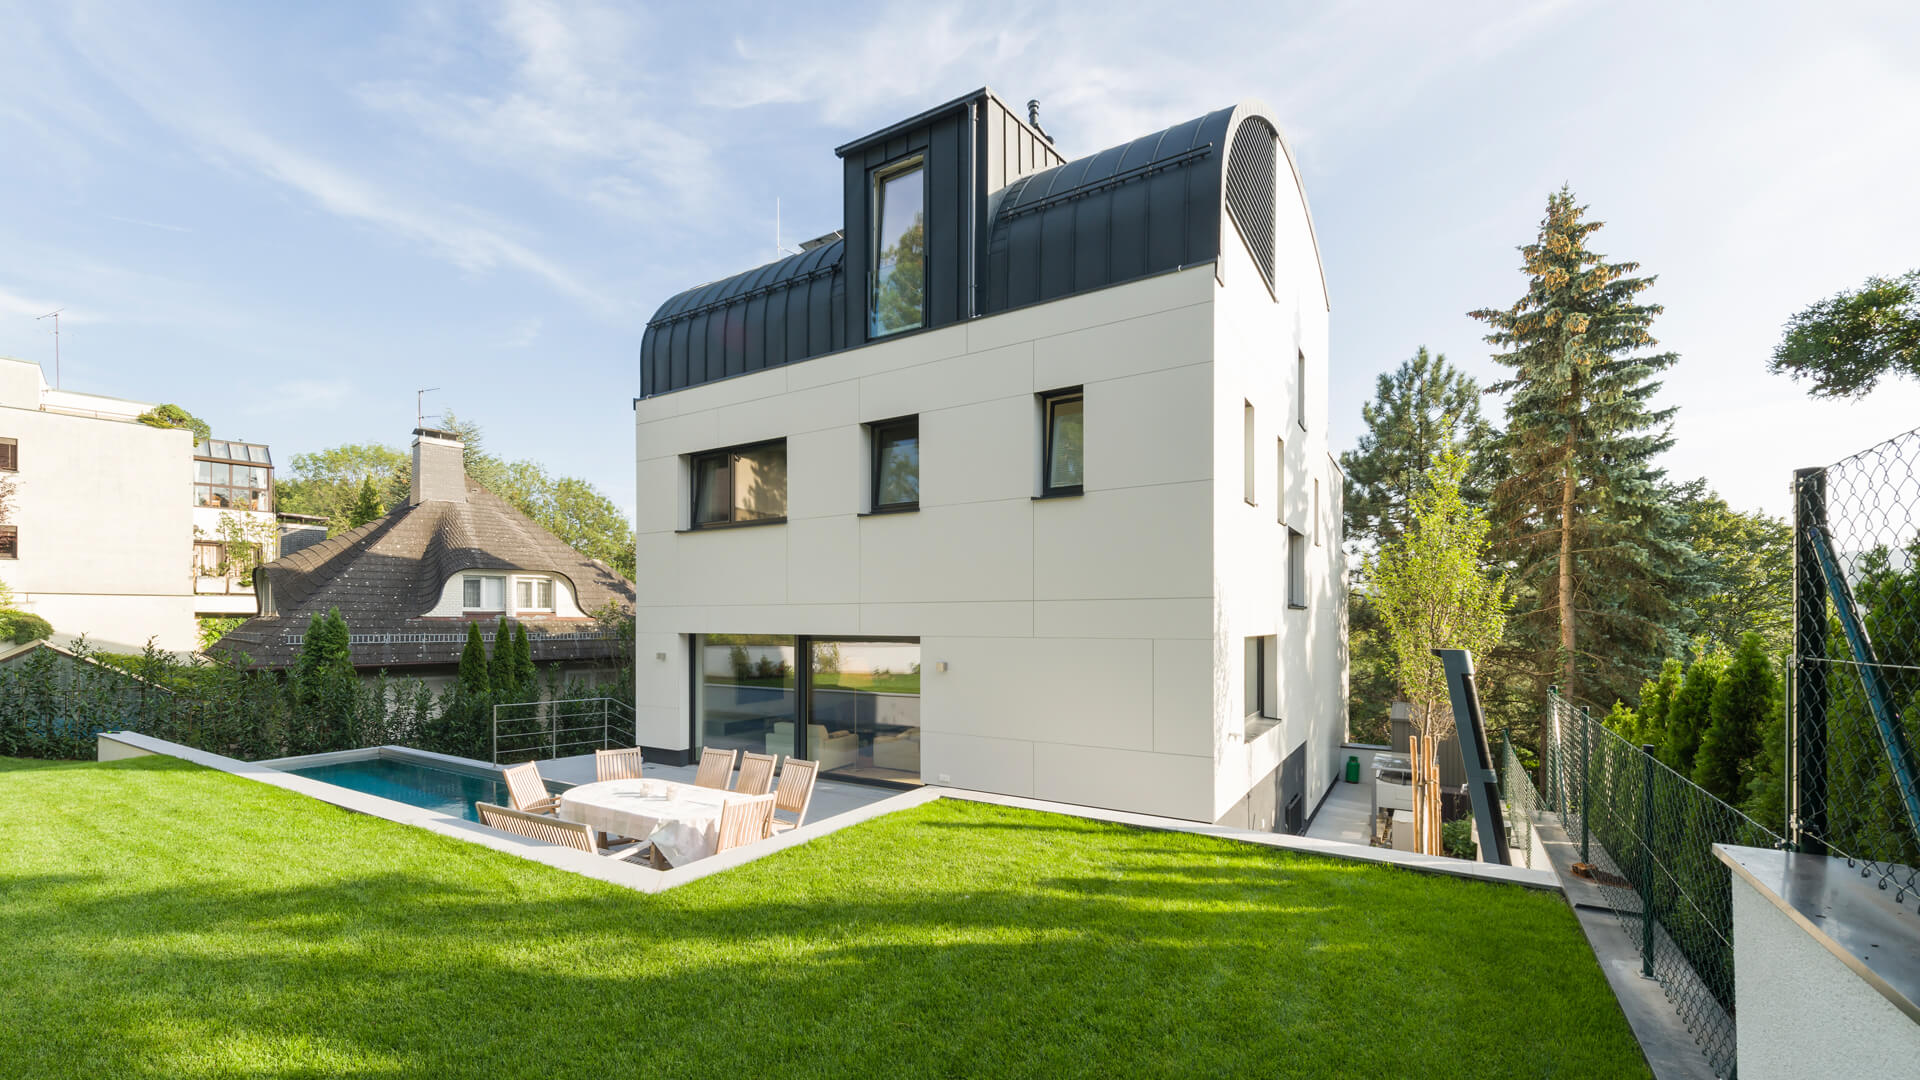 Haus lagler snp architektur for Haus architektur